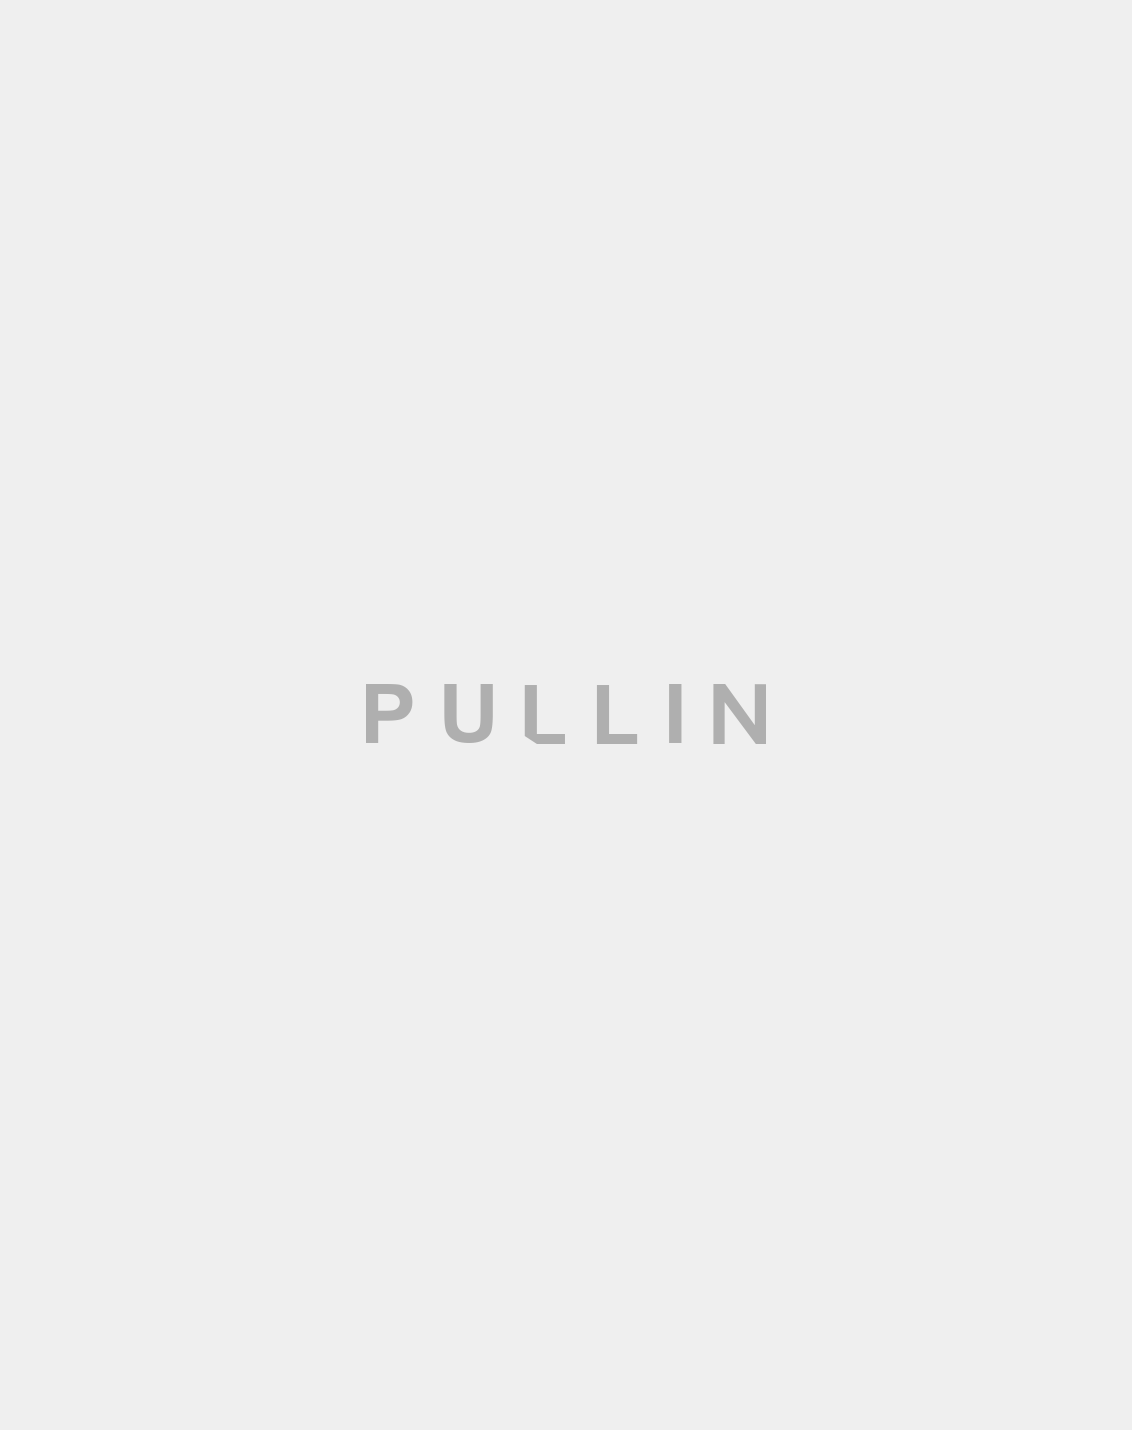 Key holder bp0691 unisex - pullin 2